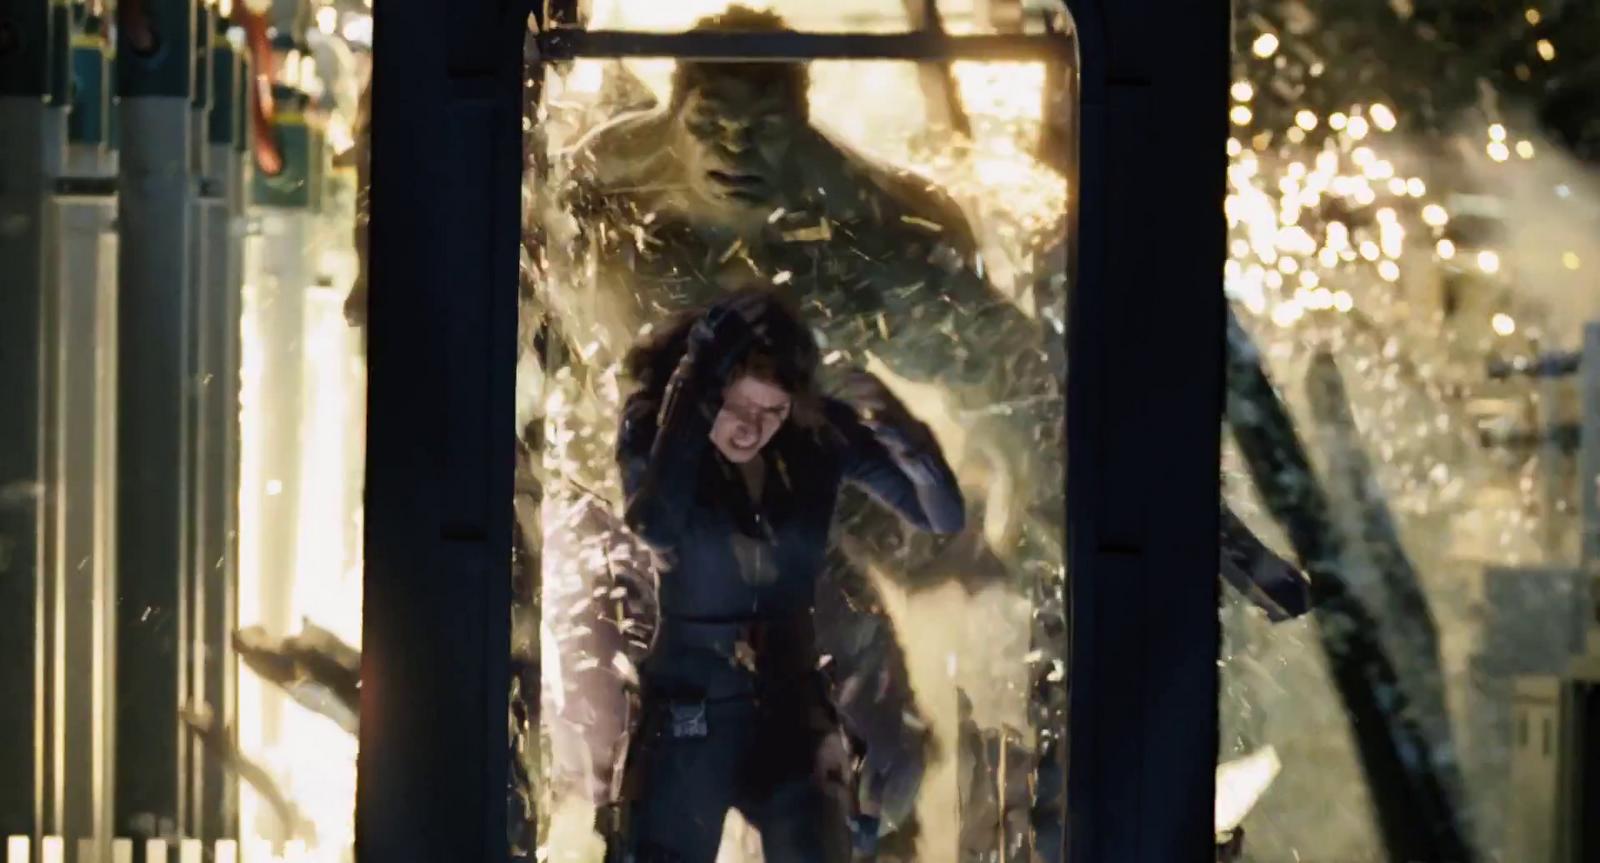 See Hulk S Kinder Gentler Side In The Avengers Trailer